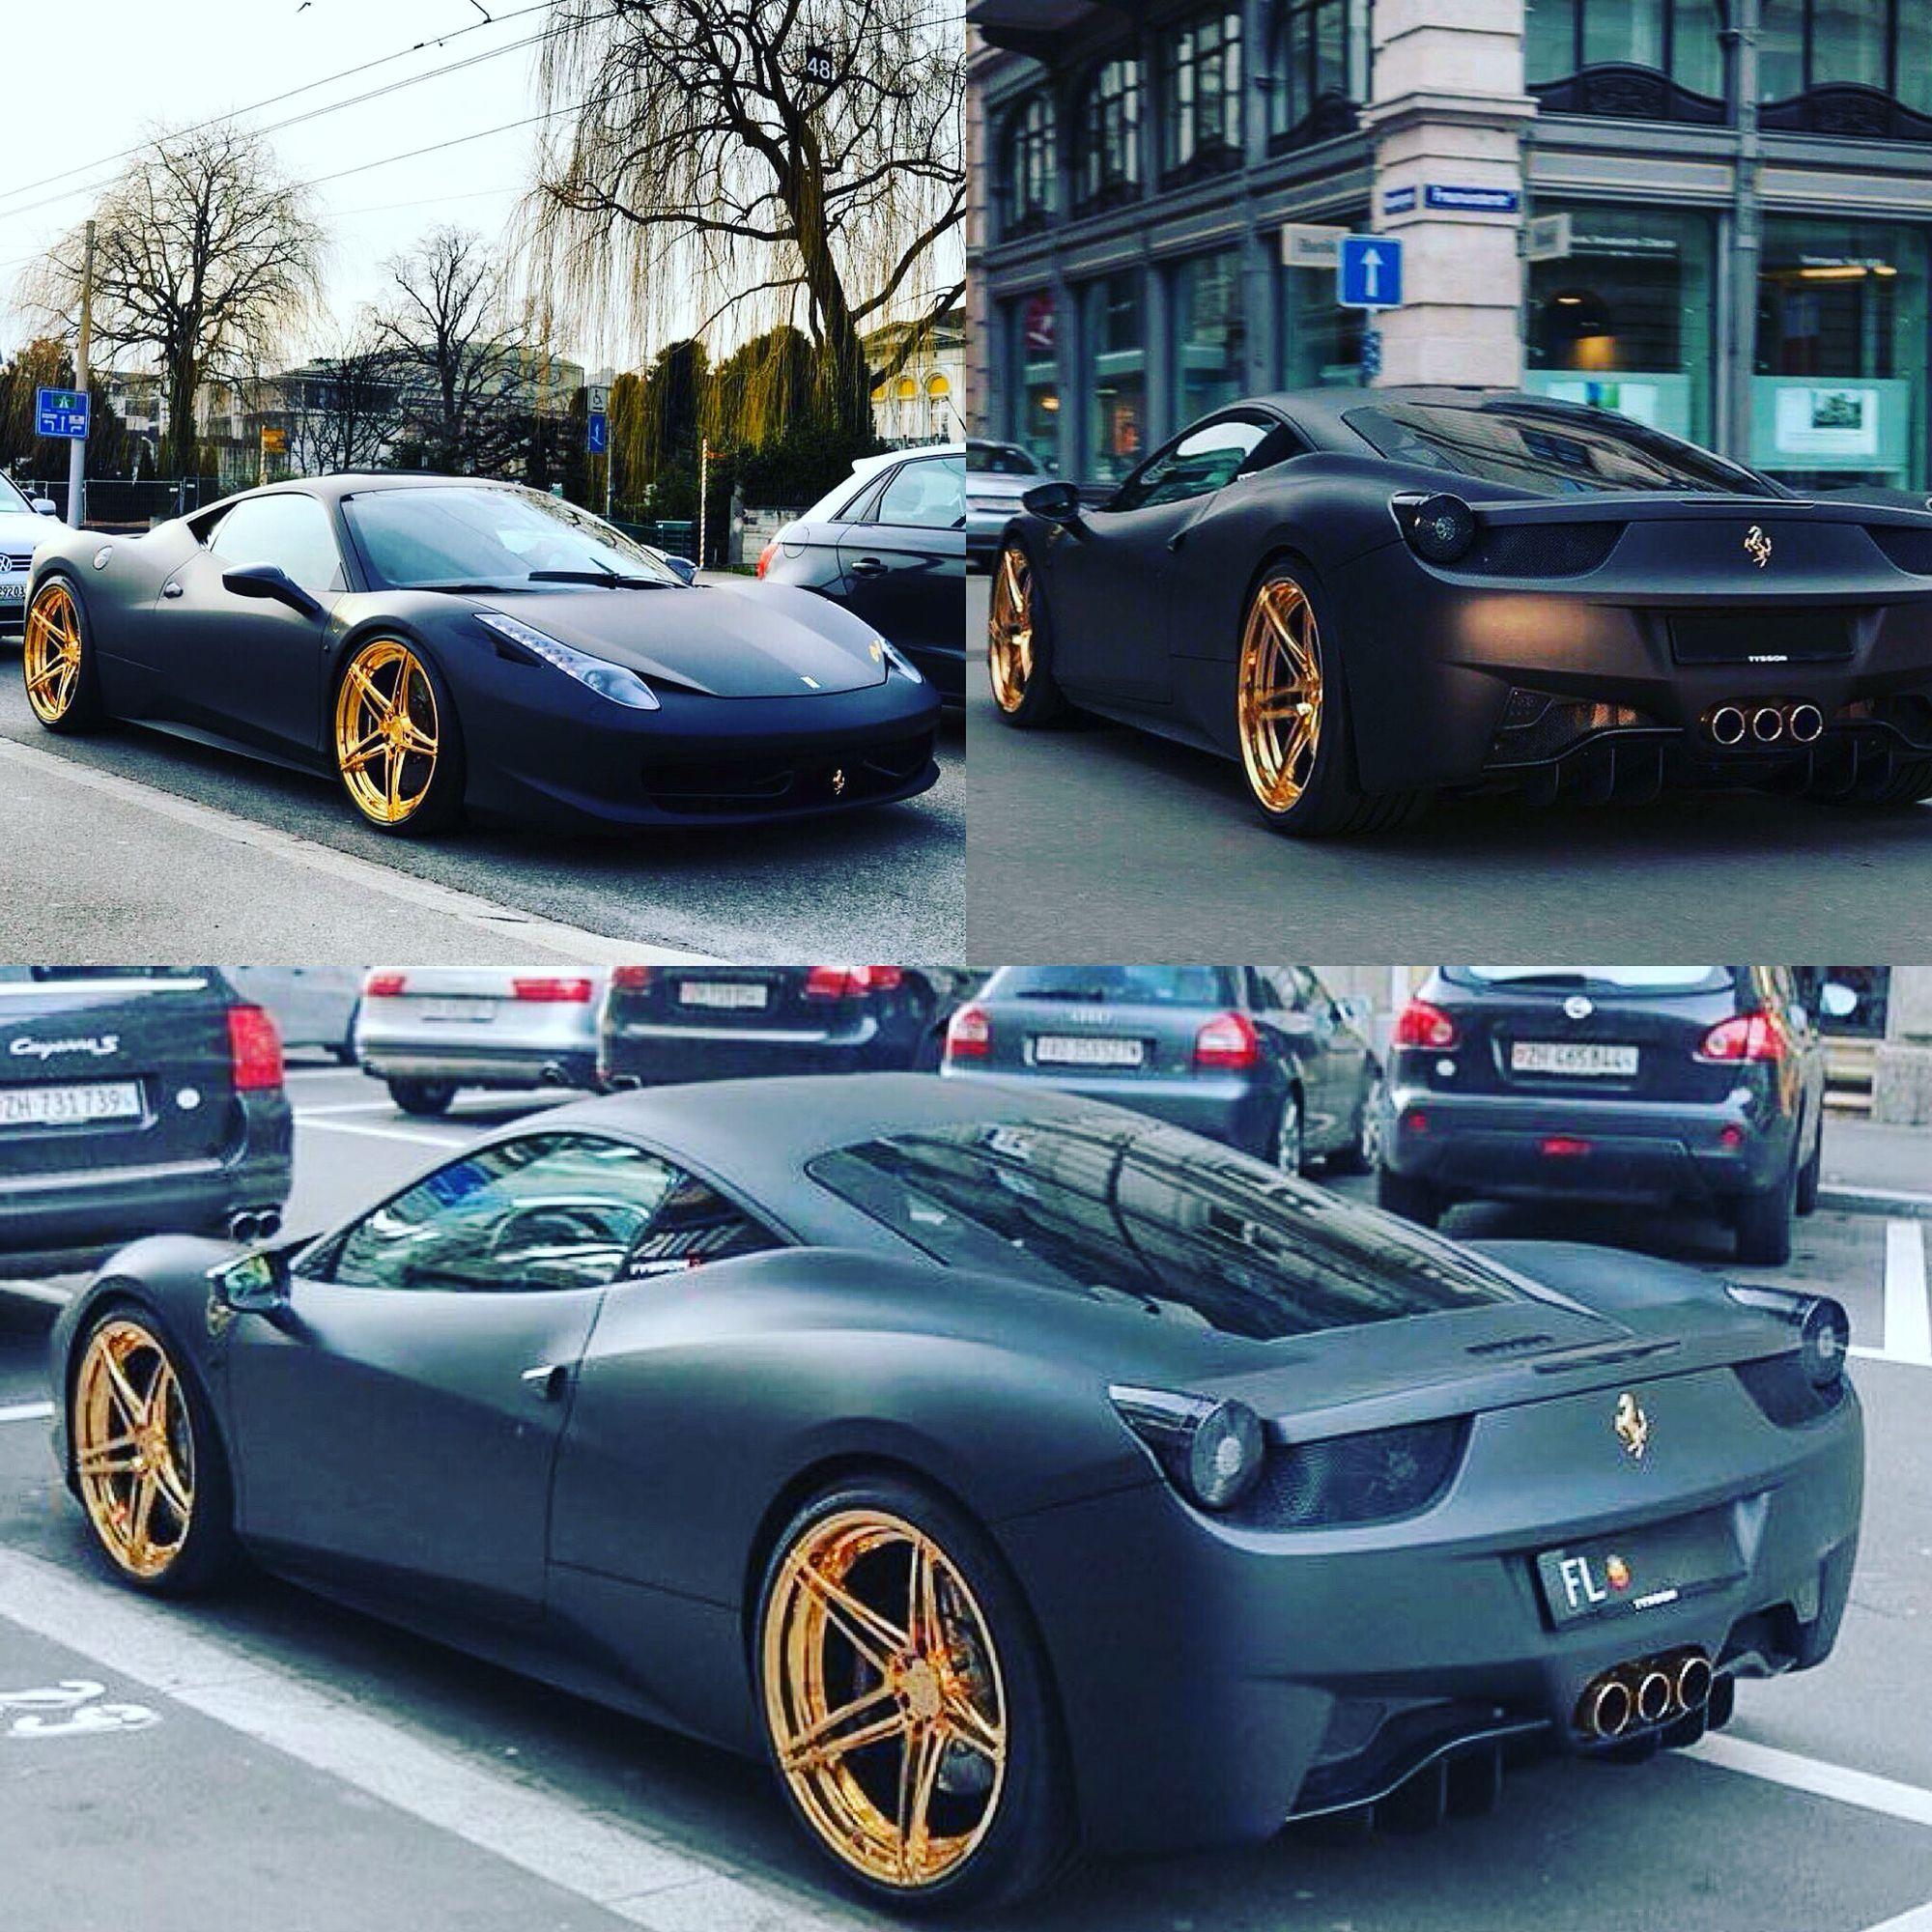 matte black and gold ferrari 458 italia - Black Ferrari 458 Italia